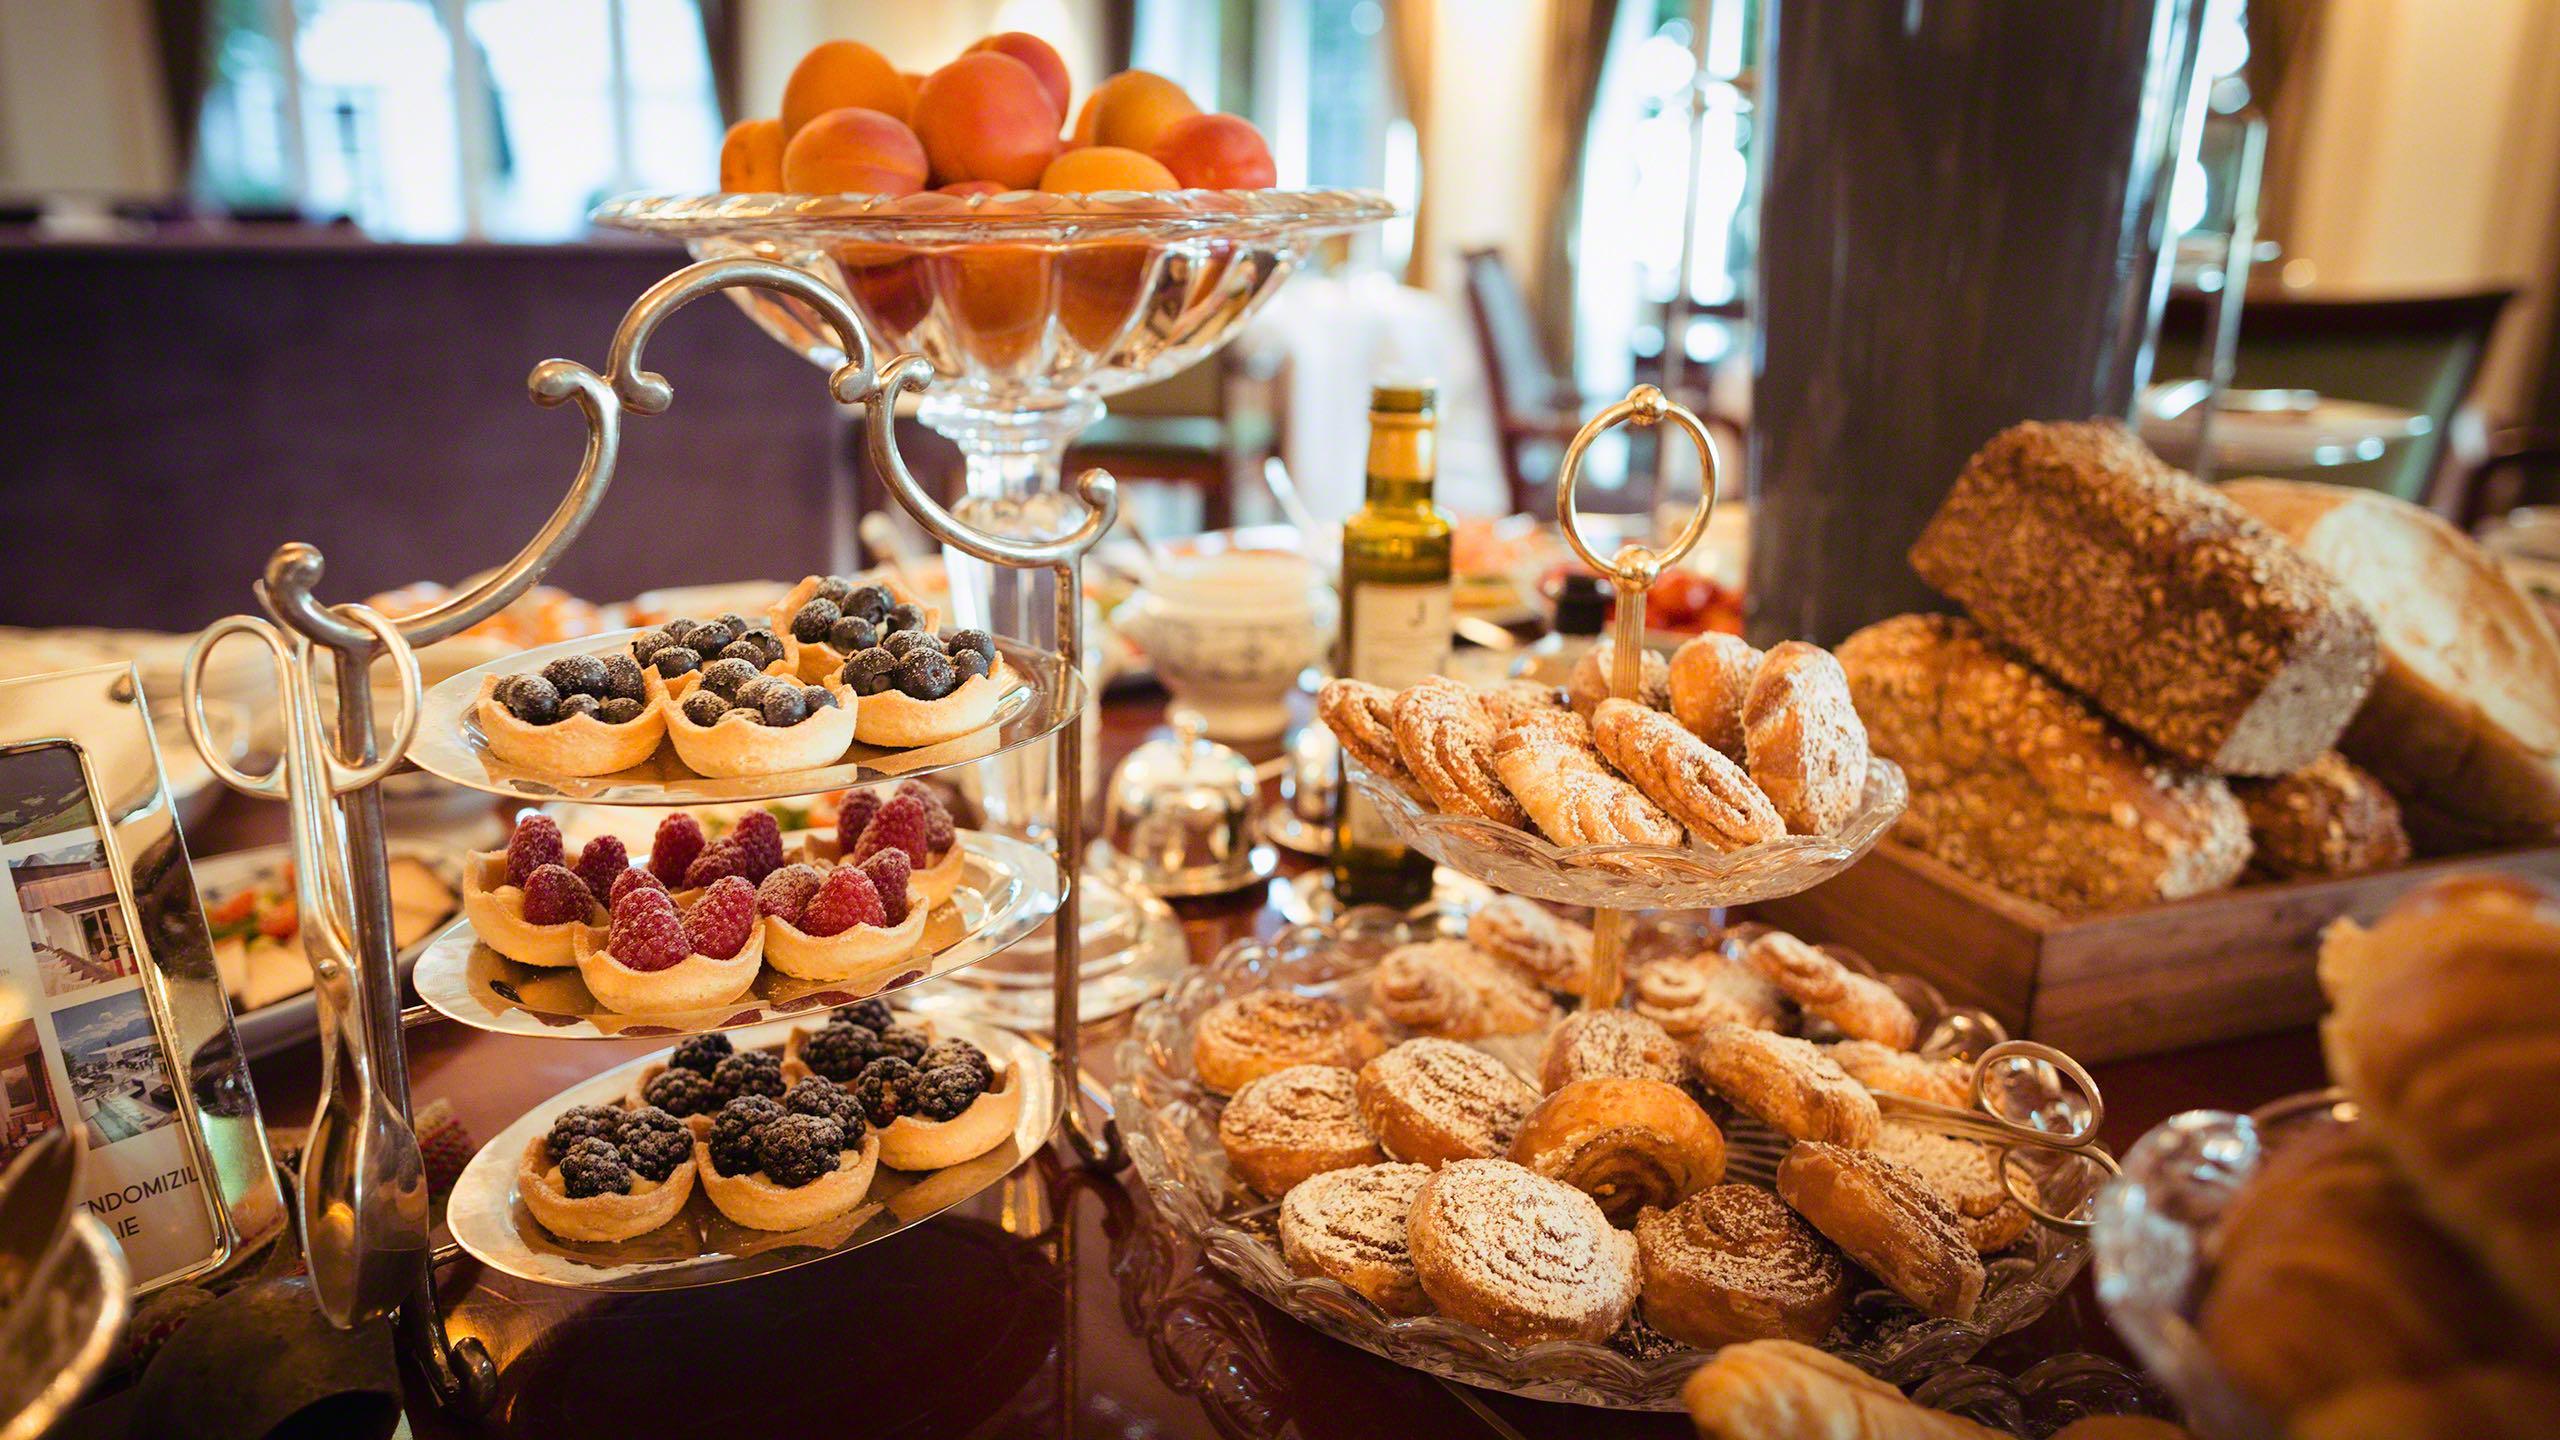 Hotel Louis C. Jacob Hamburg Frühstücks Buffet mit süßem Gebäck, köstlichen Kuchen, Brot, Croissants, Aprikosen